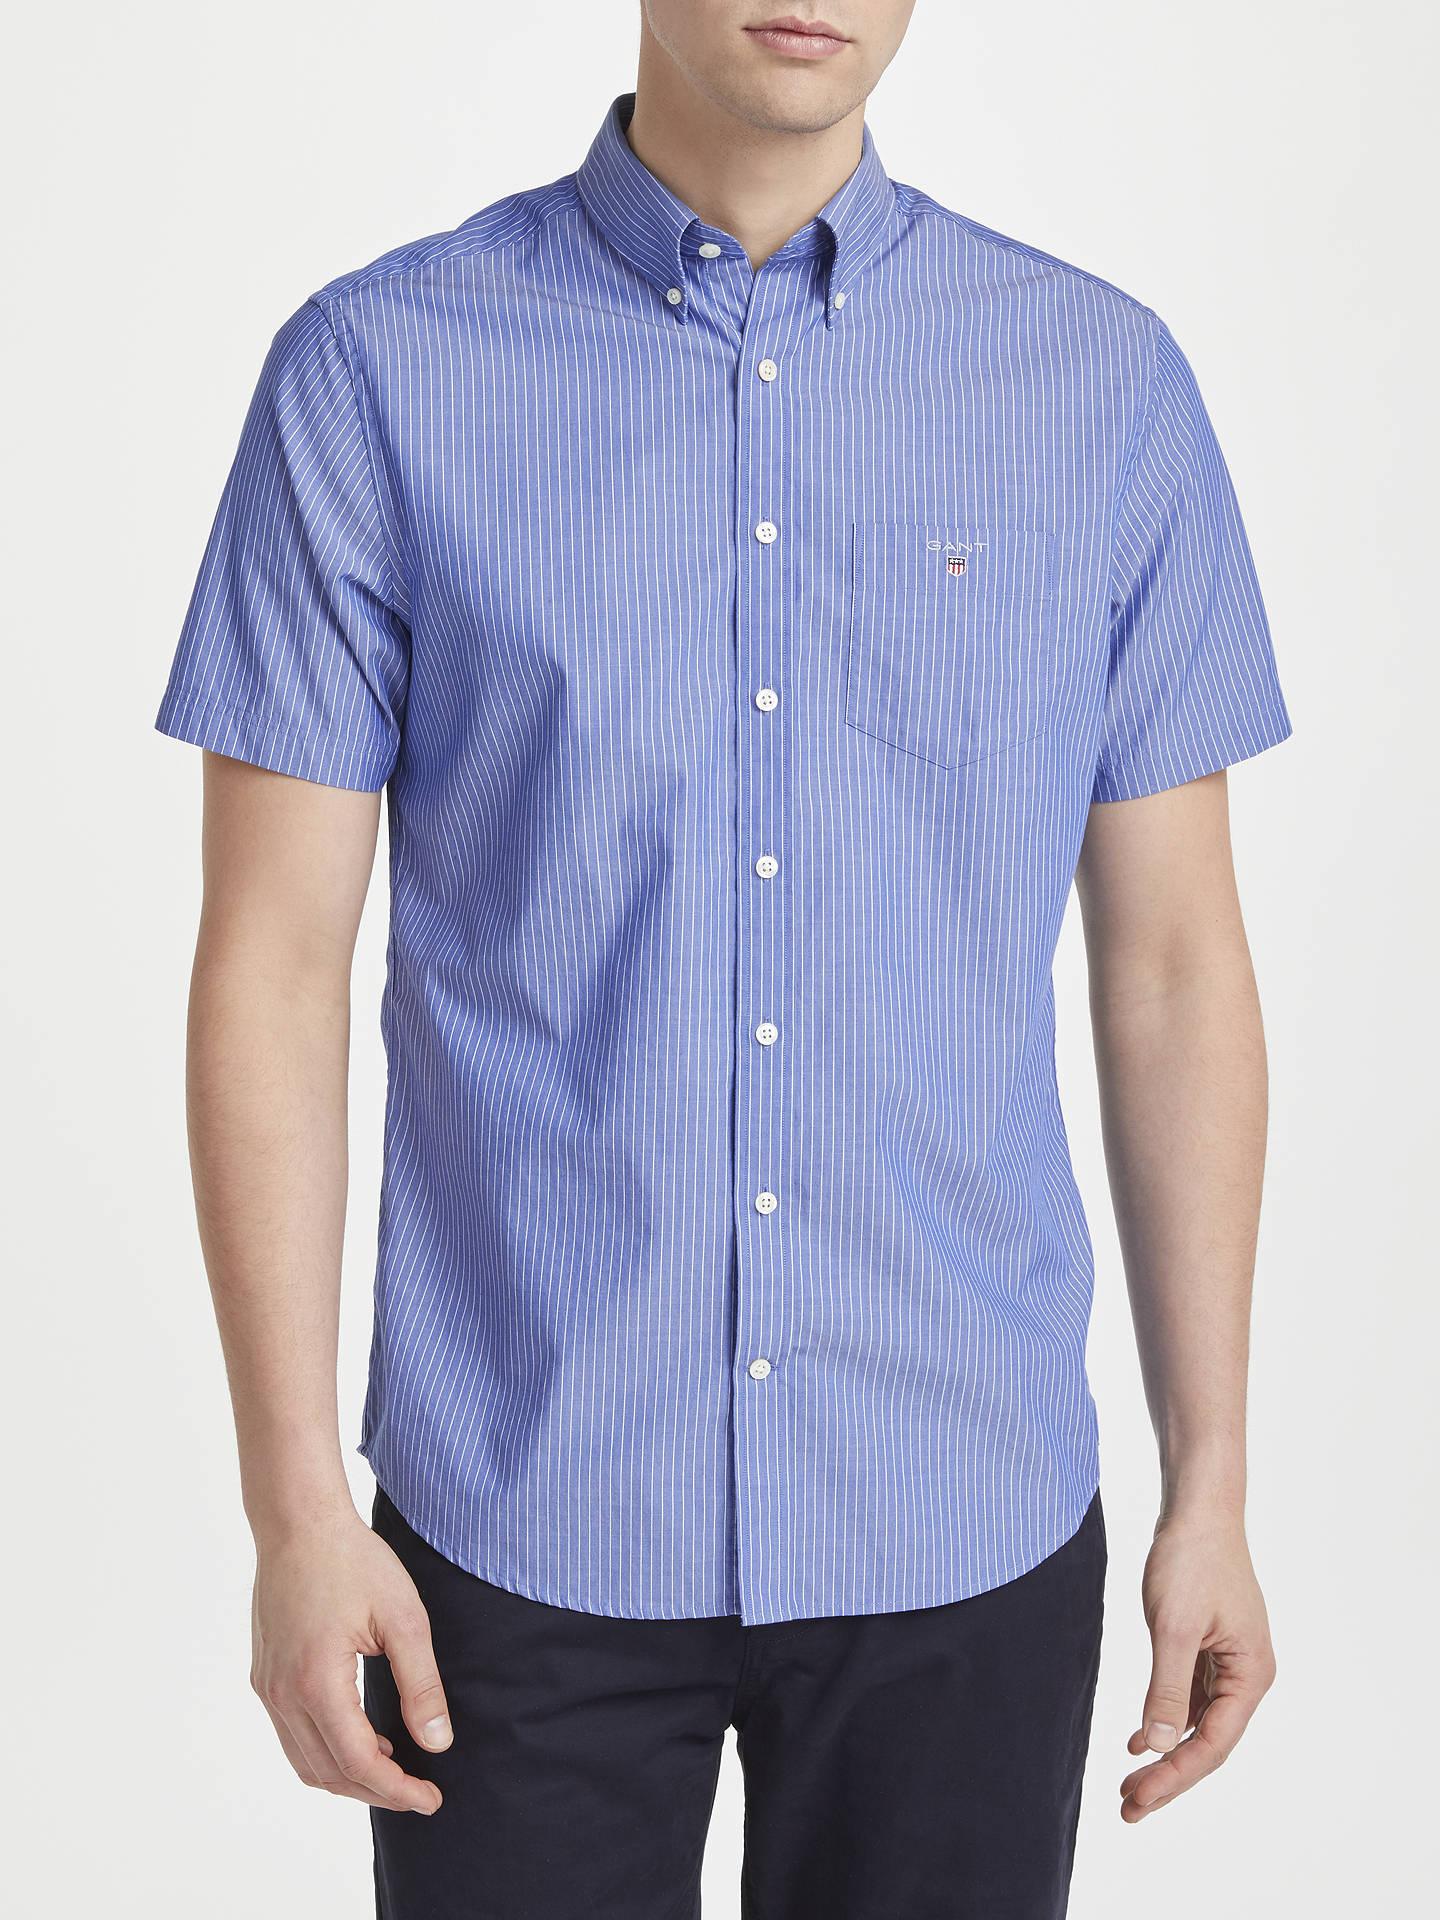 6b5d4334ed Buy Gant Poplin Short Sleeve Pinstripe Poplin Shirt, Yale Blue, S Online at  johnlewis ...